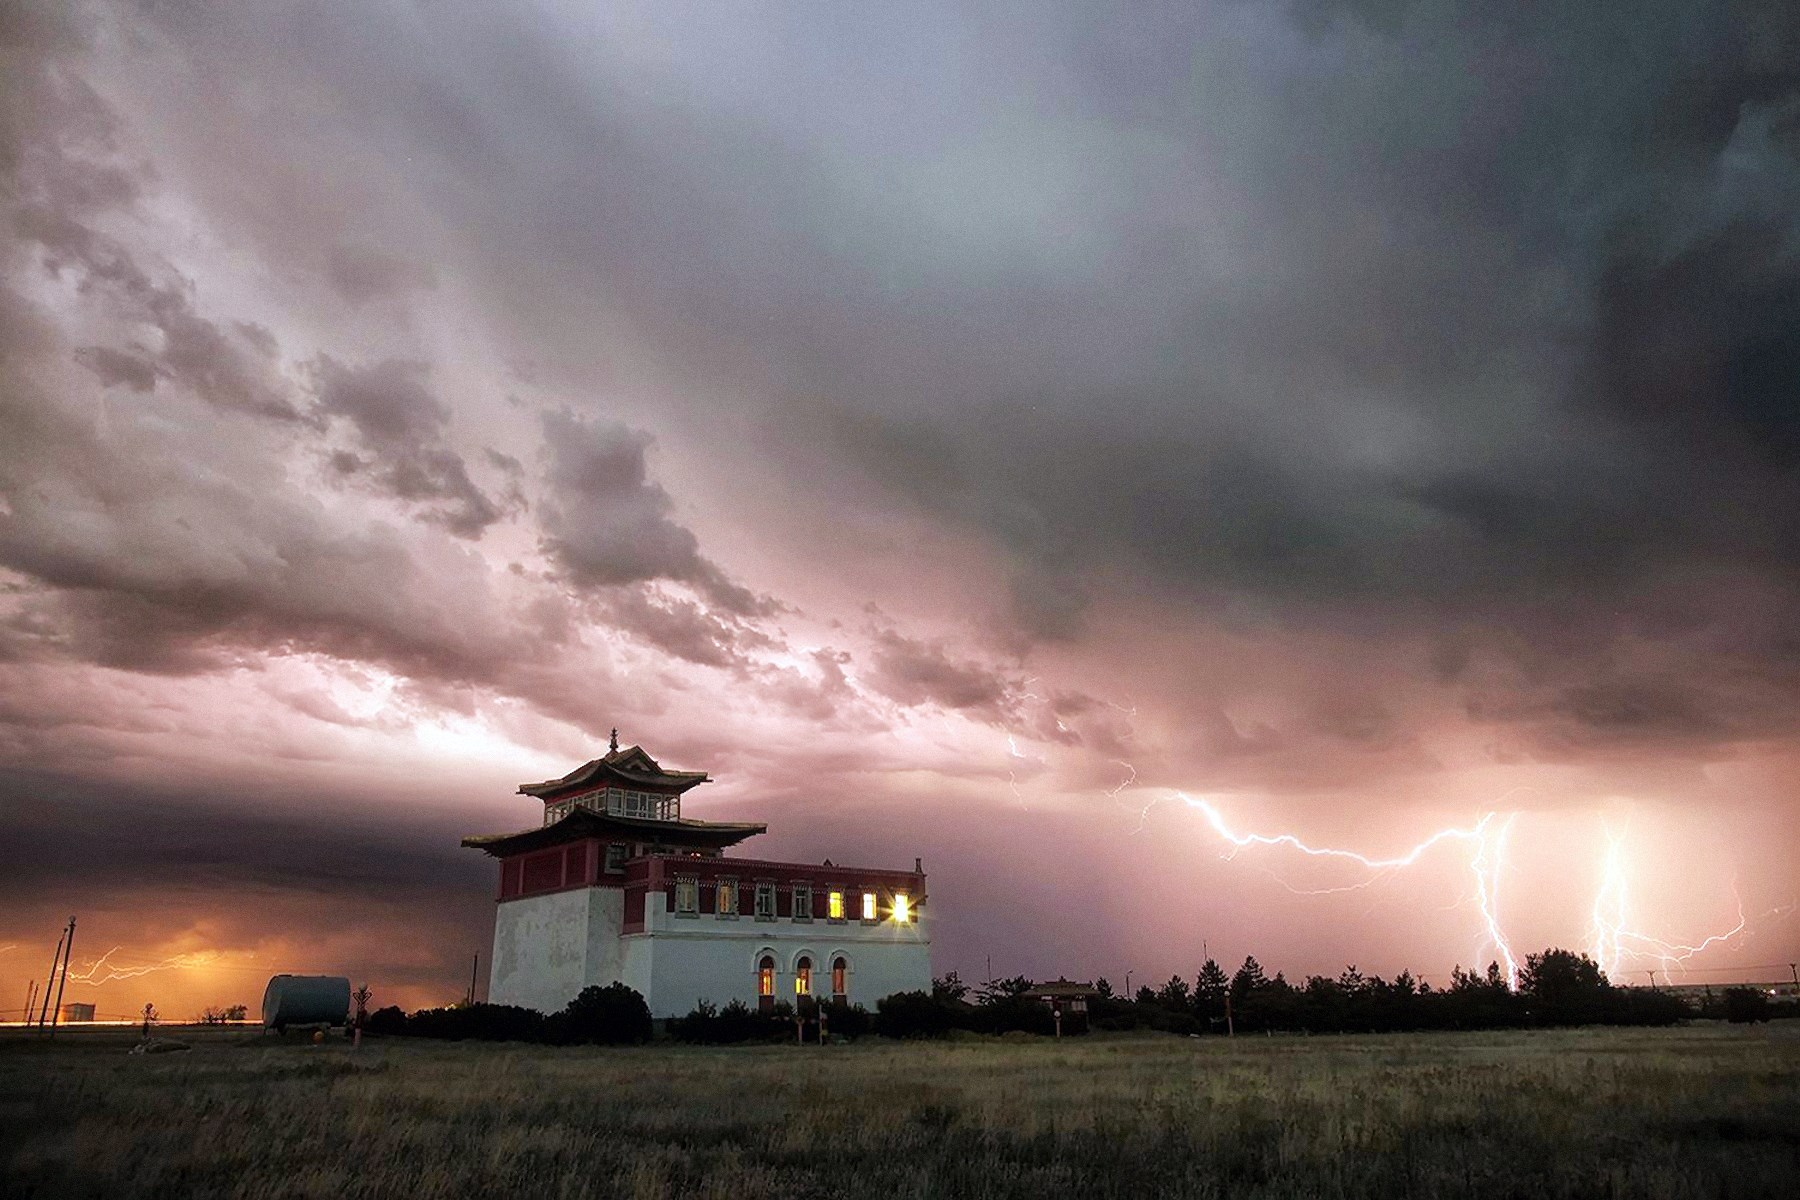 00 Andrei Akuginov. Summer Thunderstorm in Kalmykiya. 2015